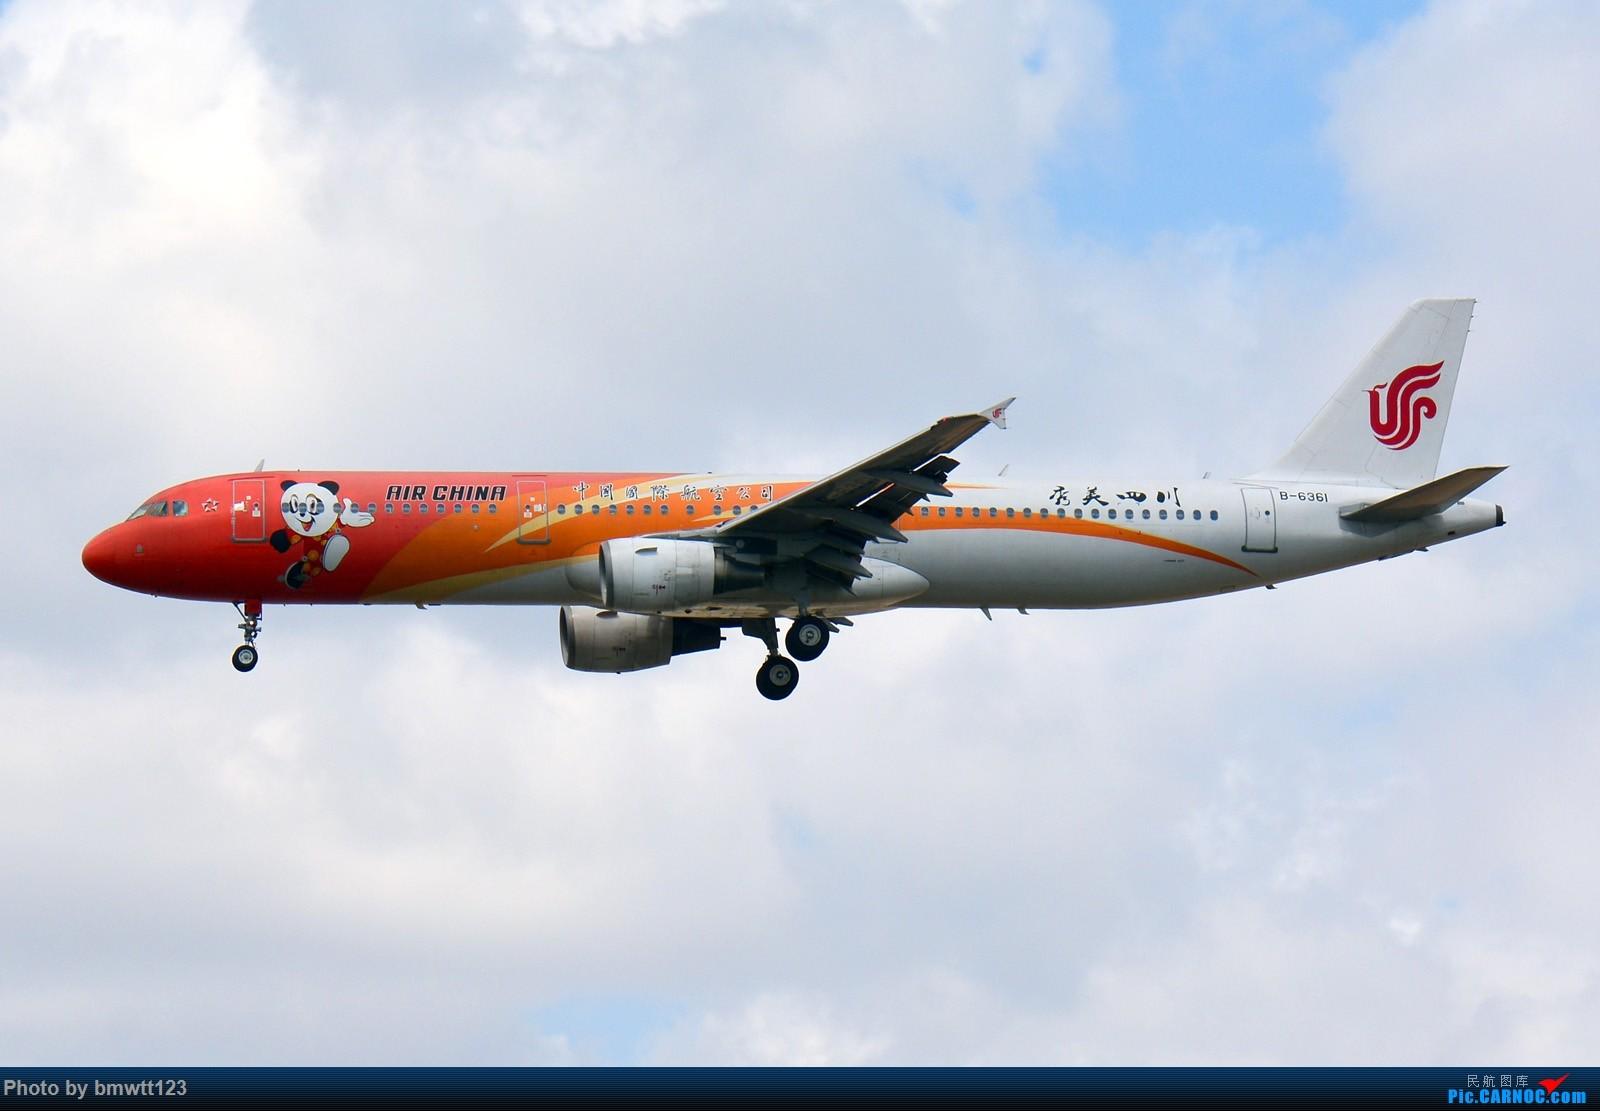 Re:[原创]【SHE沈阳】好天好货,国航彩绘 - 秀美四川 A321 (红头熊猫)B-6361 AIRBUS A321-200 B-6361 中国沈阳桃仙国际机场